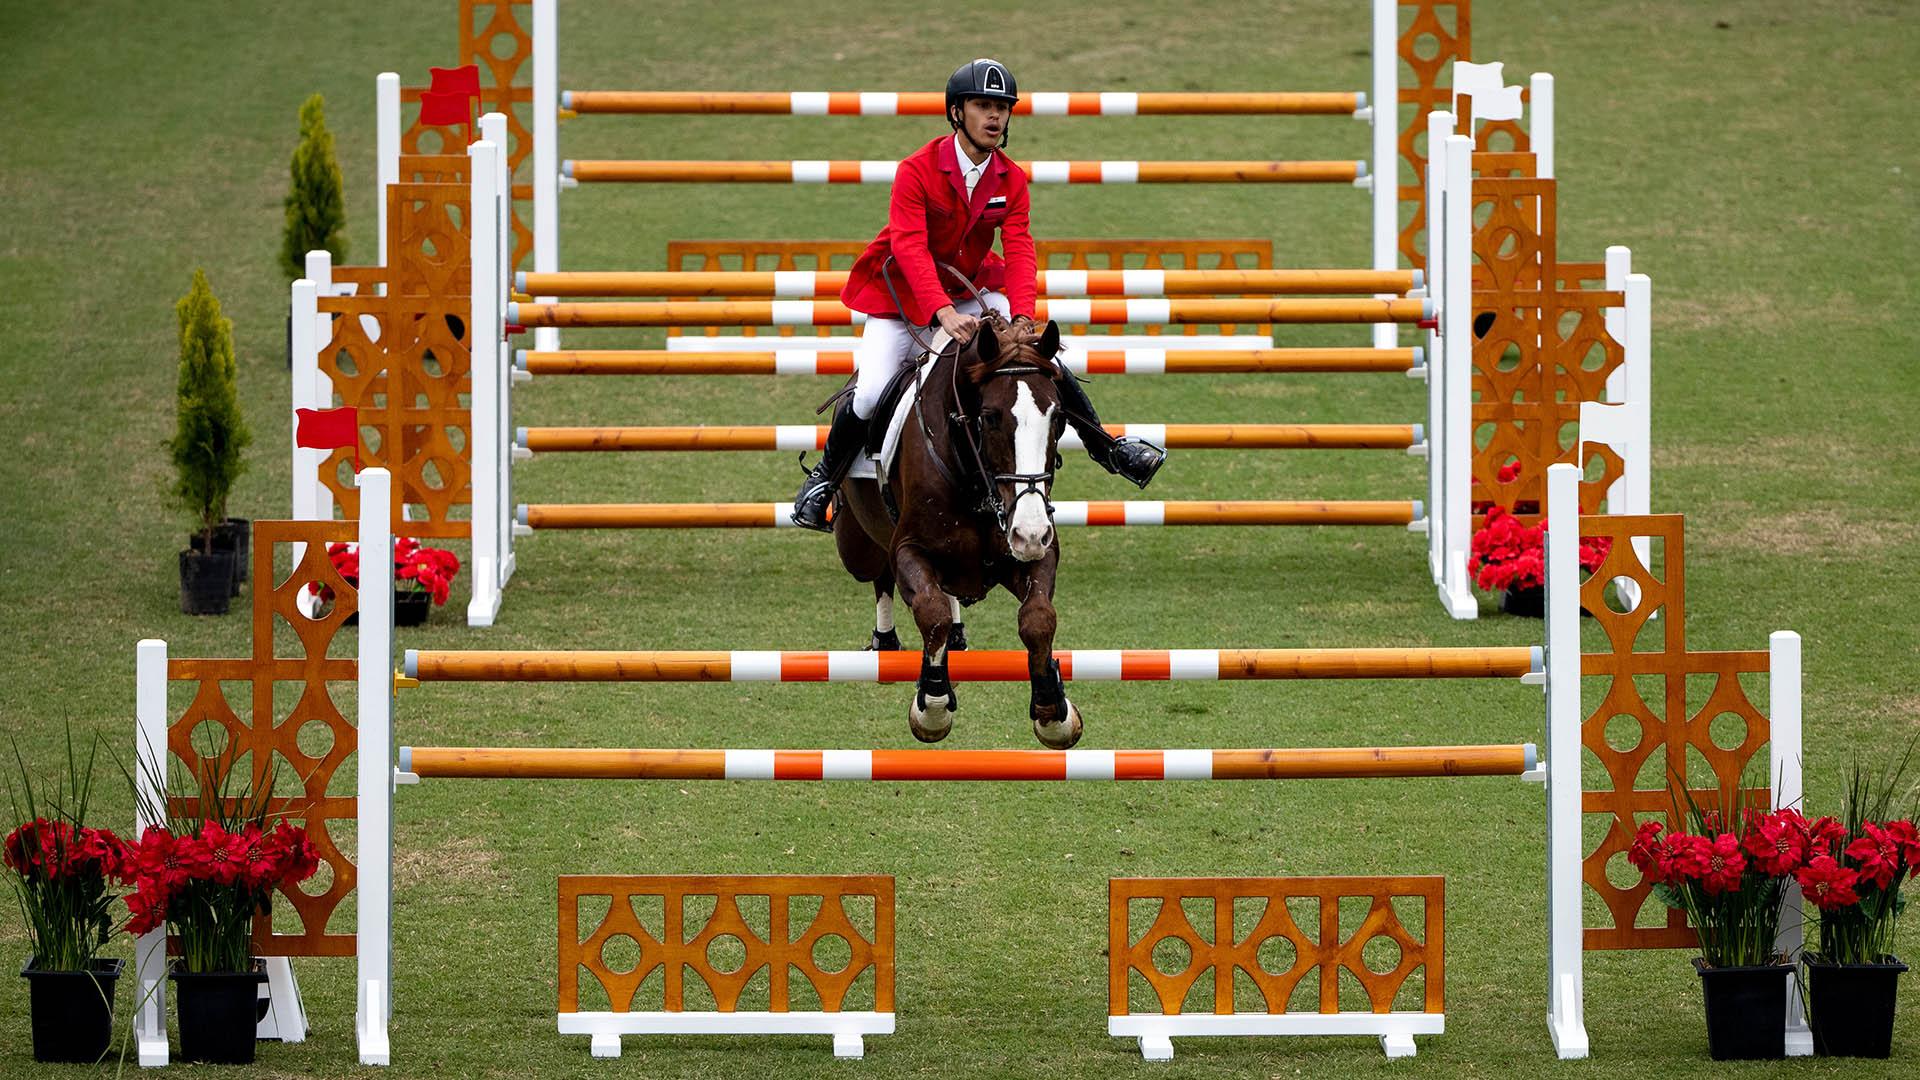 El salto individual de Momen Zindaki, de Siria, junto a su caballo Cooper Larquinoen el Club Hípico Argentino del parque verde (Foto: REUTERS)